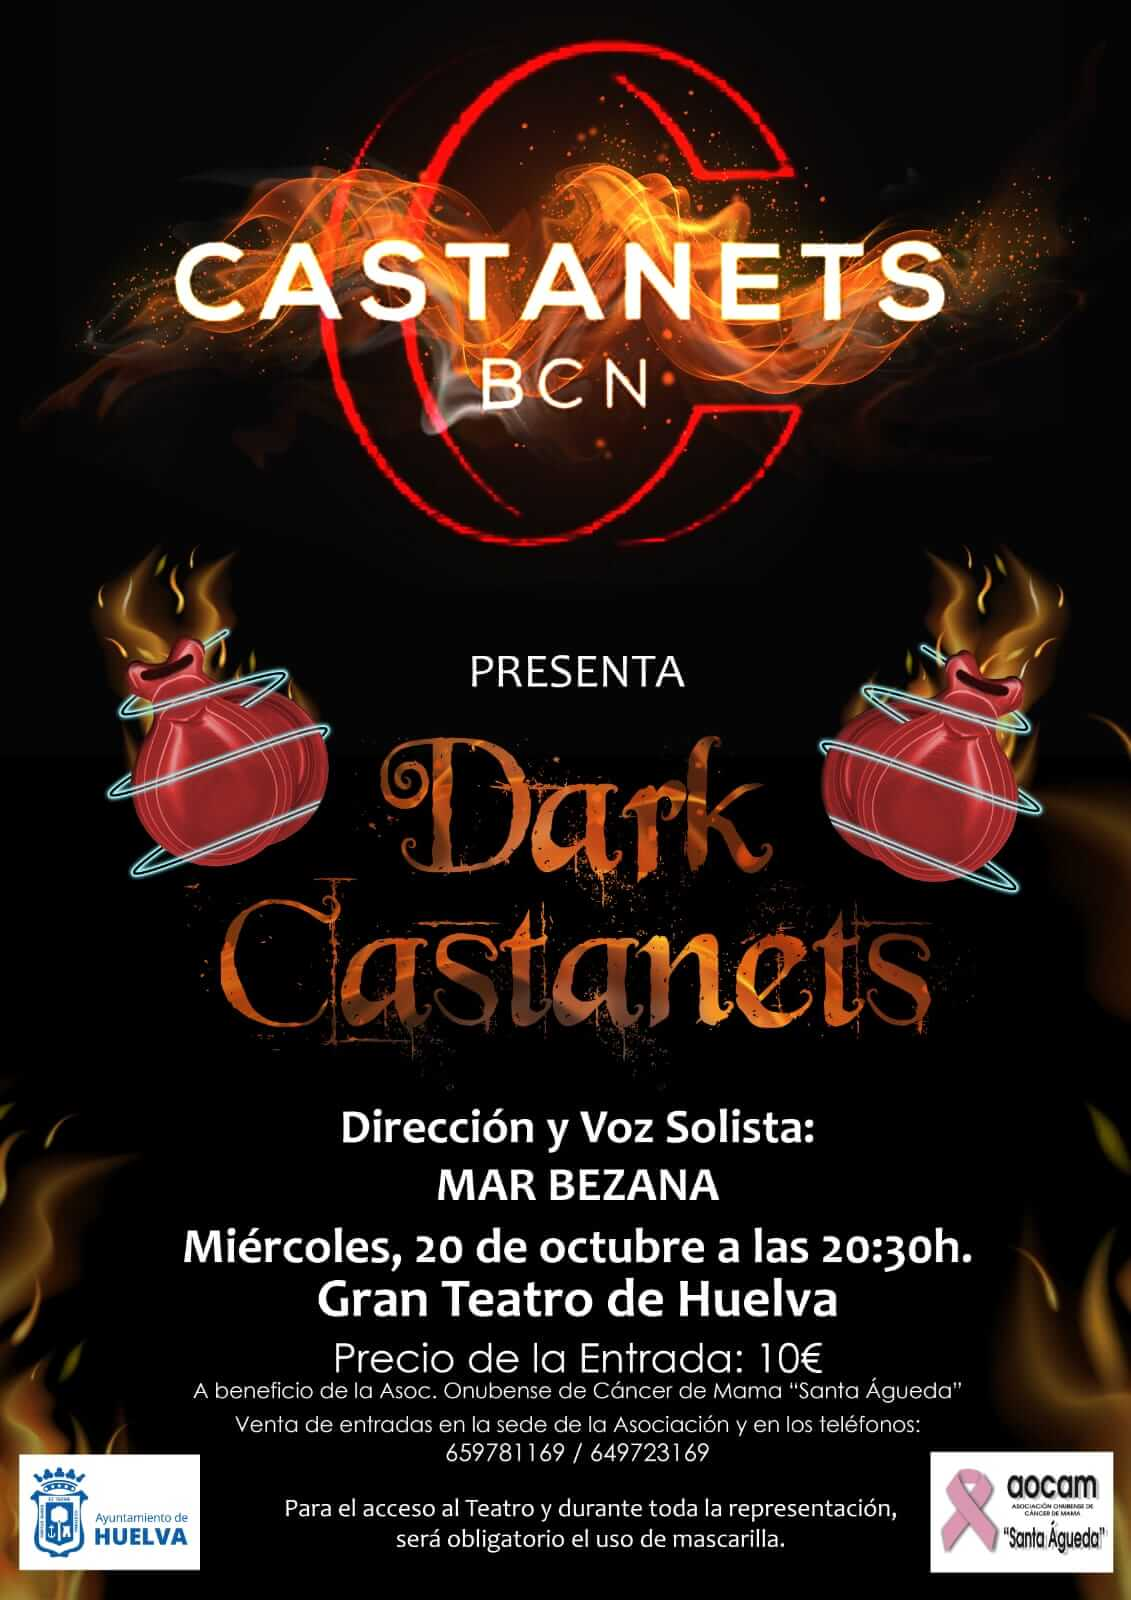 Castanets Bcn presenta DARK CASTANETS en el Gran Teatro de Huelva 20 de octubre de 2021